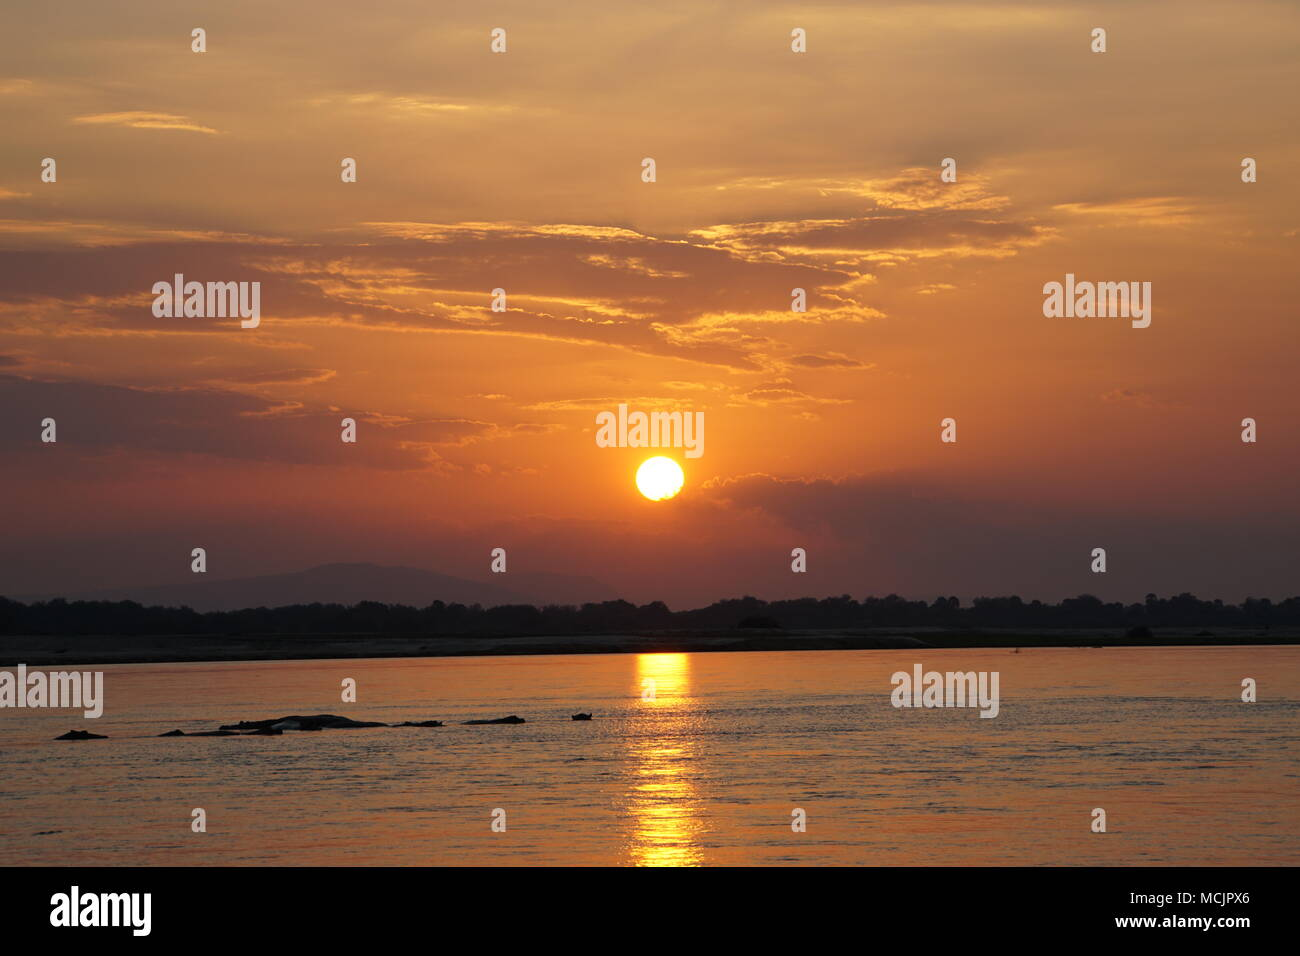 Beautiful Sunset during Safari at a river in Tanzania / Africa - Stock Image